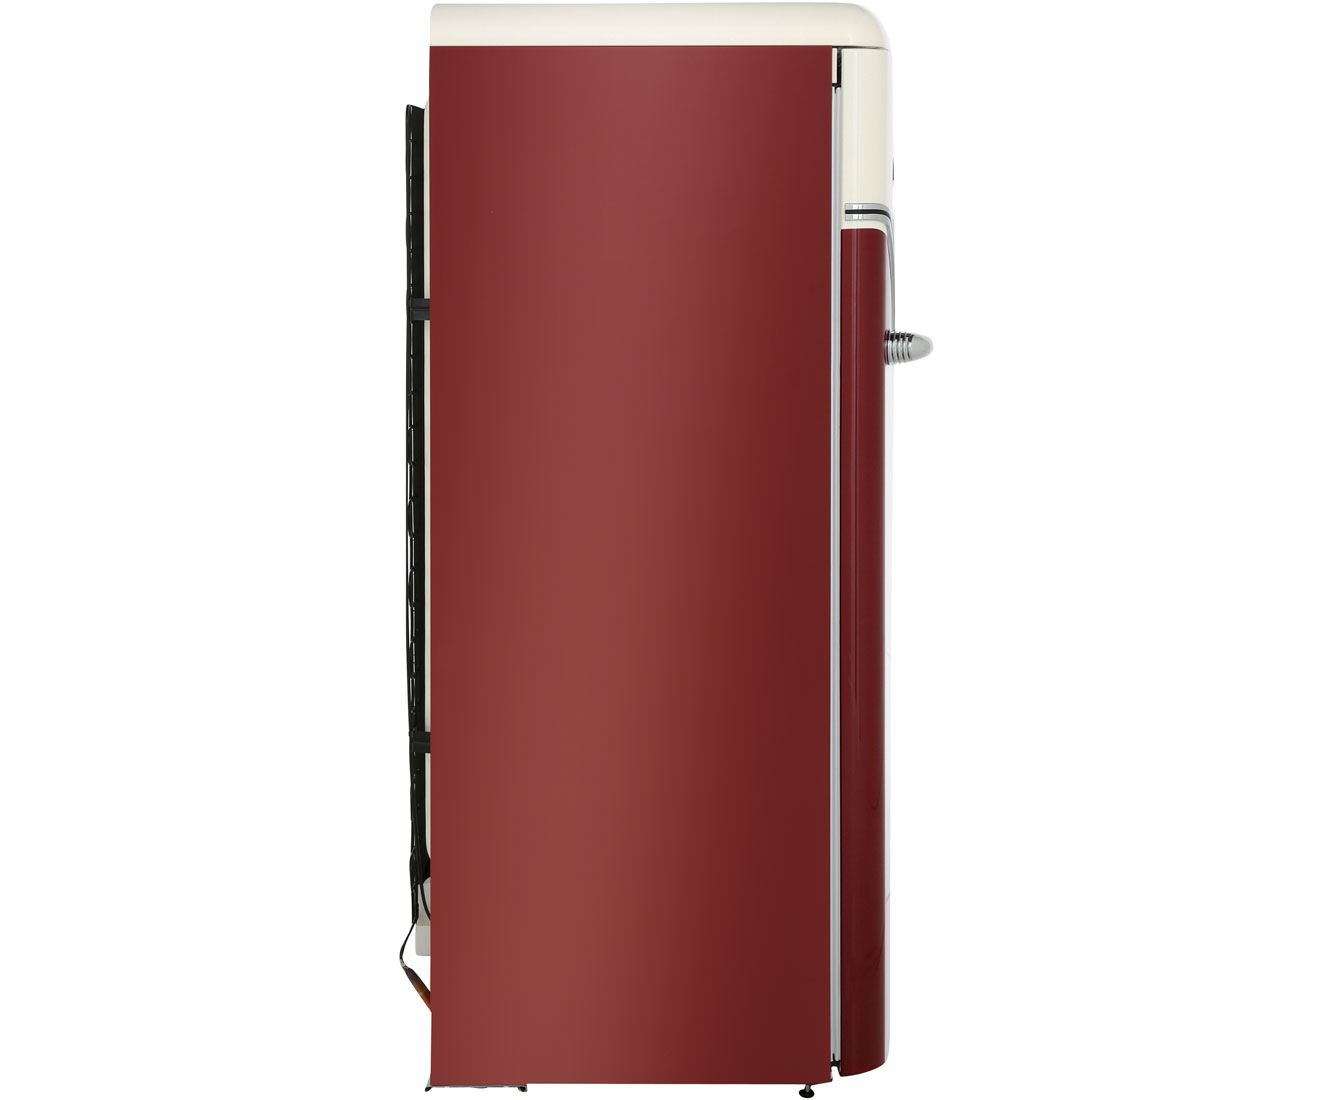 Gorenje Kühlschrank Vw Preis : Retro kühlschrank günstig kaufen ebay